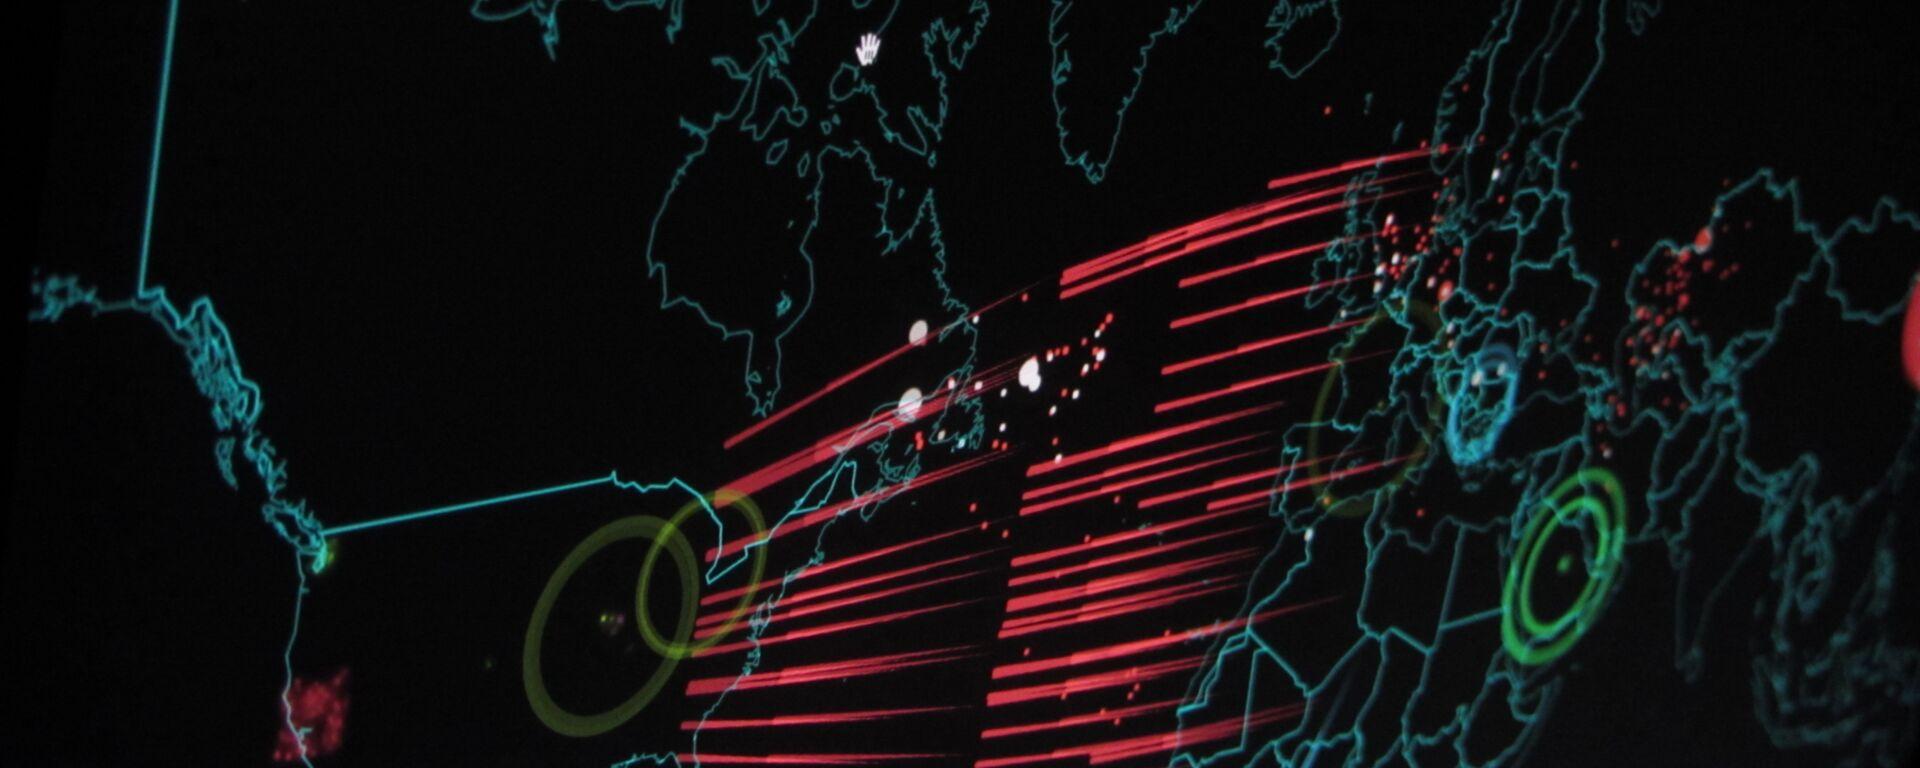 Ciberataques (imagen referencial) - Sputnik Mundo, 1920, 16.01.2021